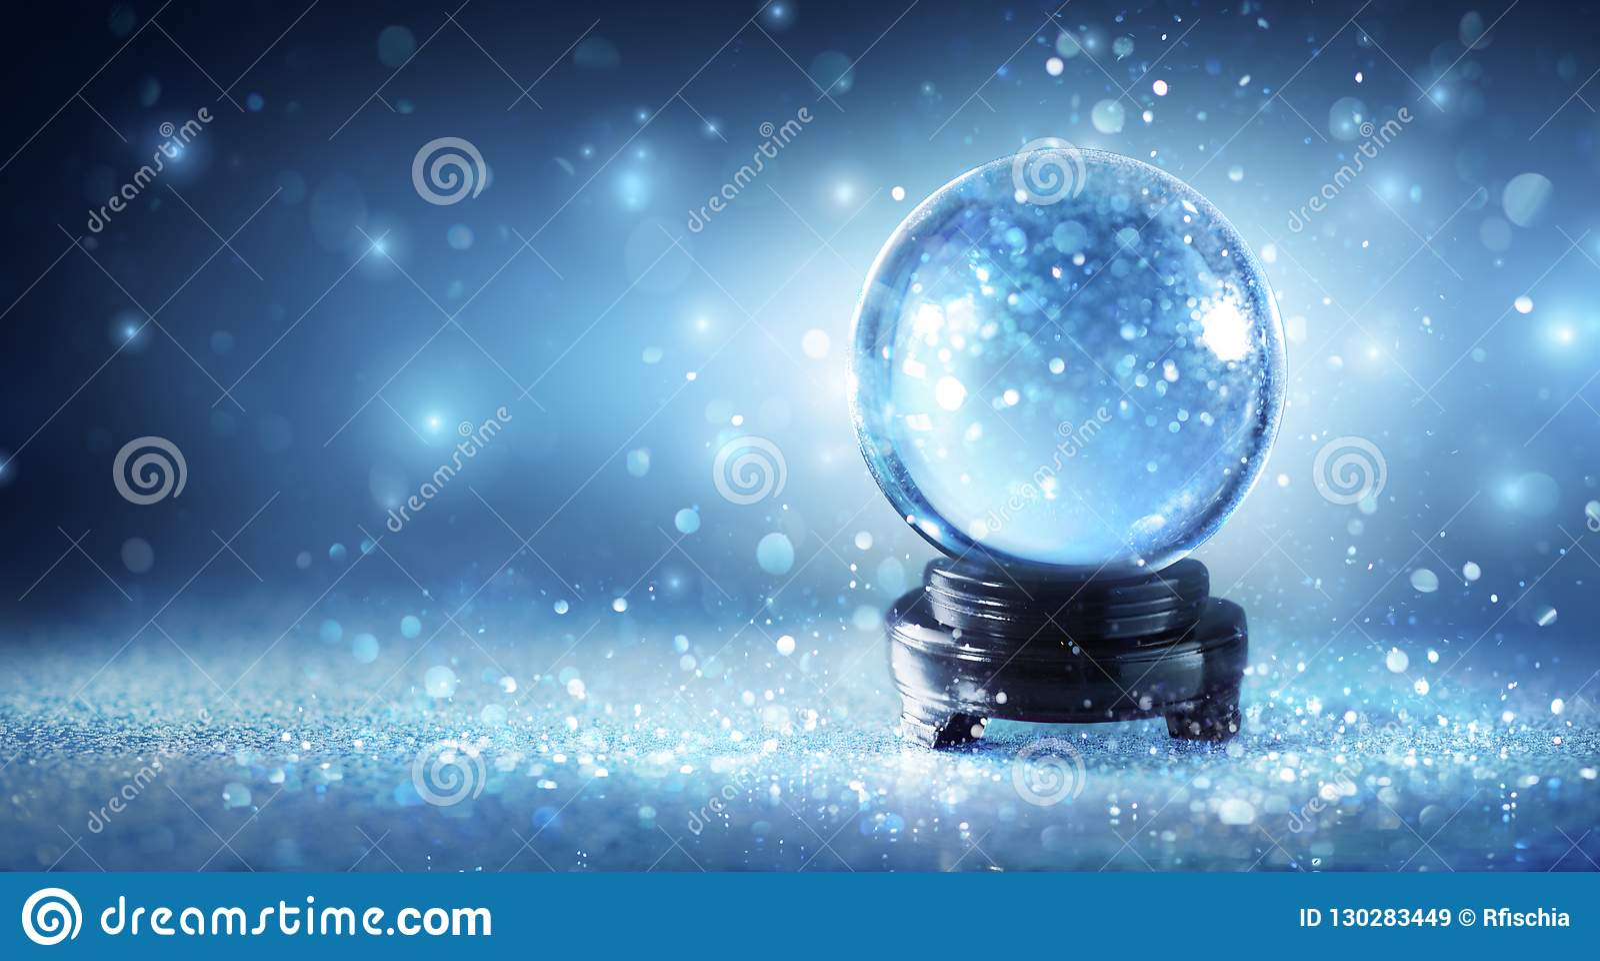 Snow Globe Sparkling